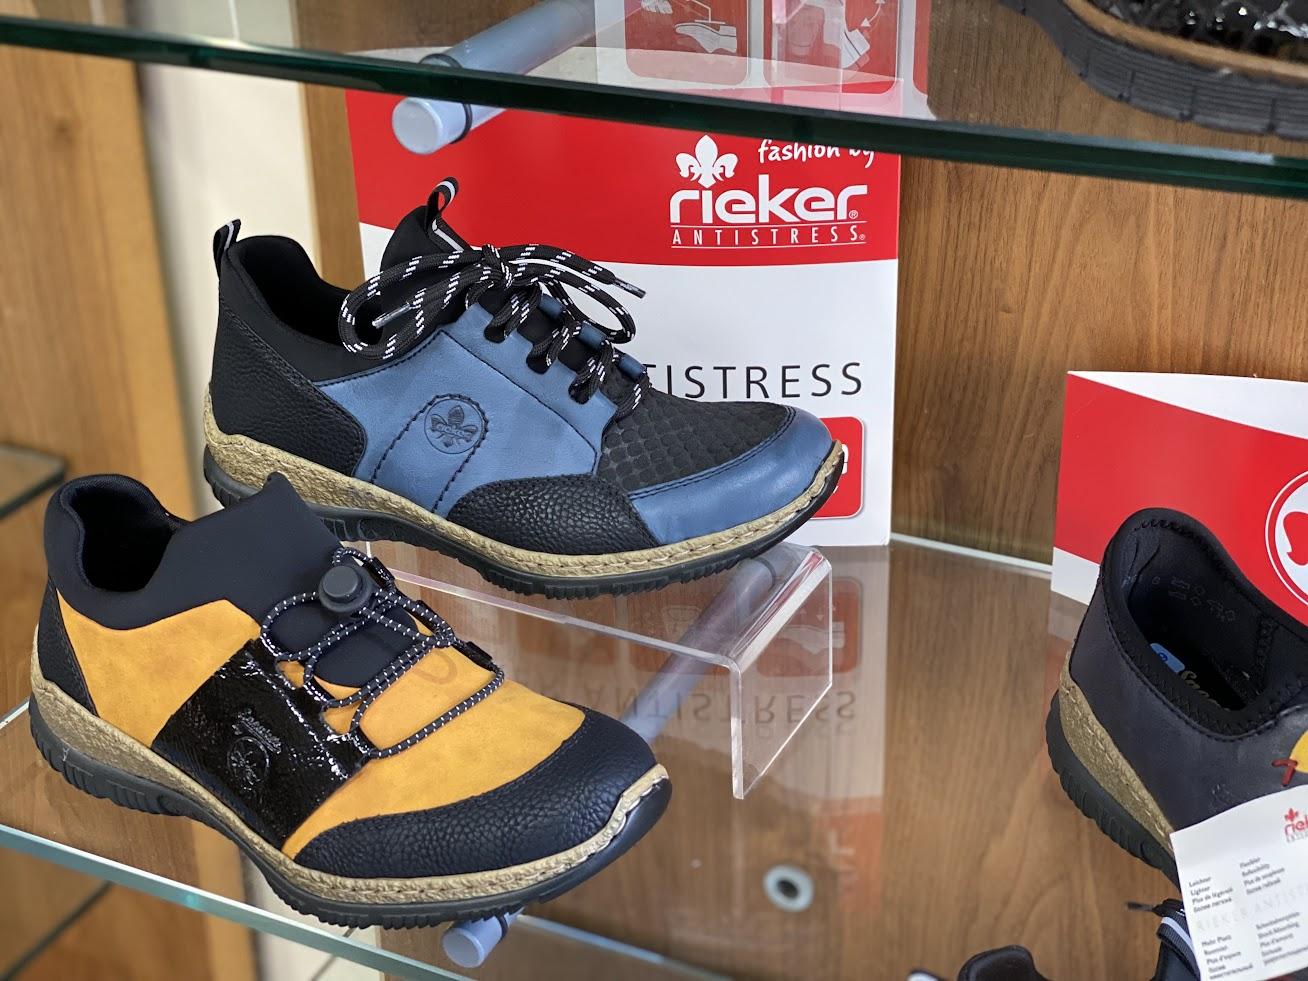 Mostyn McKenzie shoe shop in Tenterden